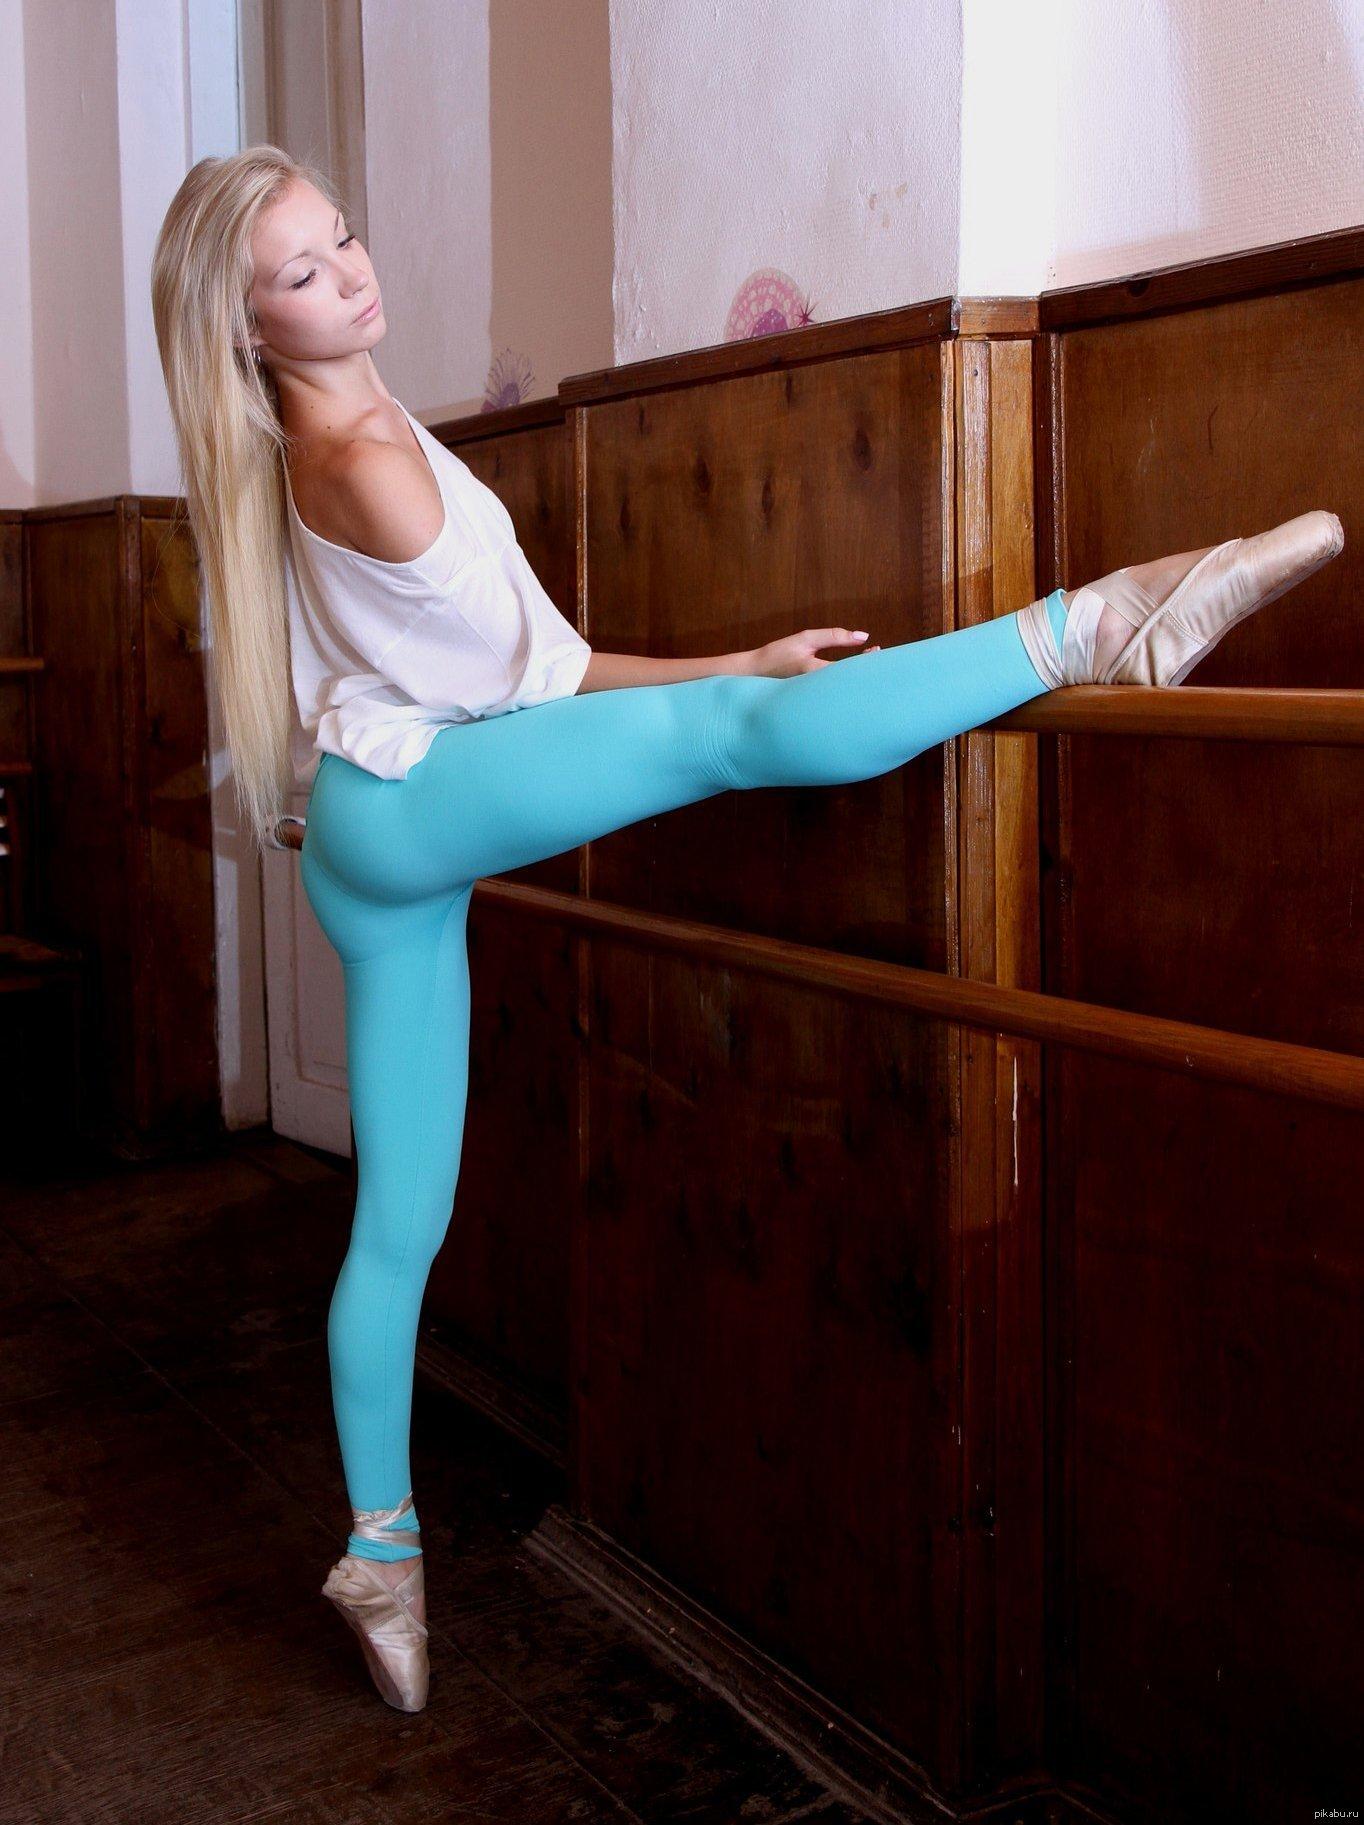 balerini-u-stanka-v-eroticheskih-pozah-foto